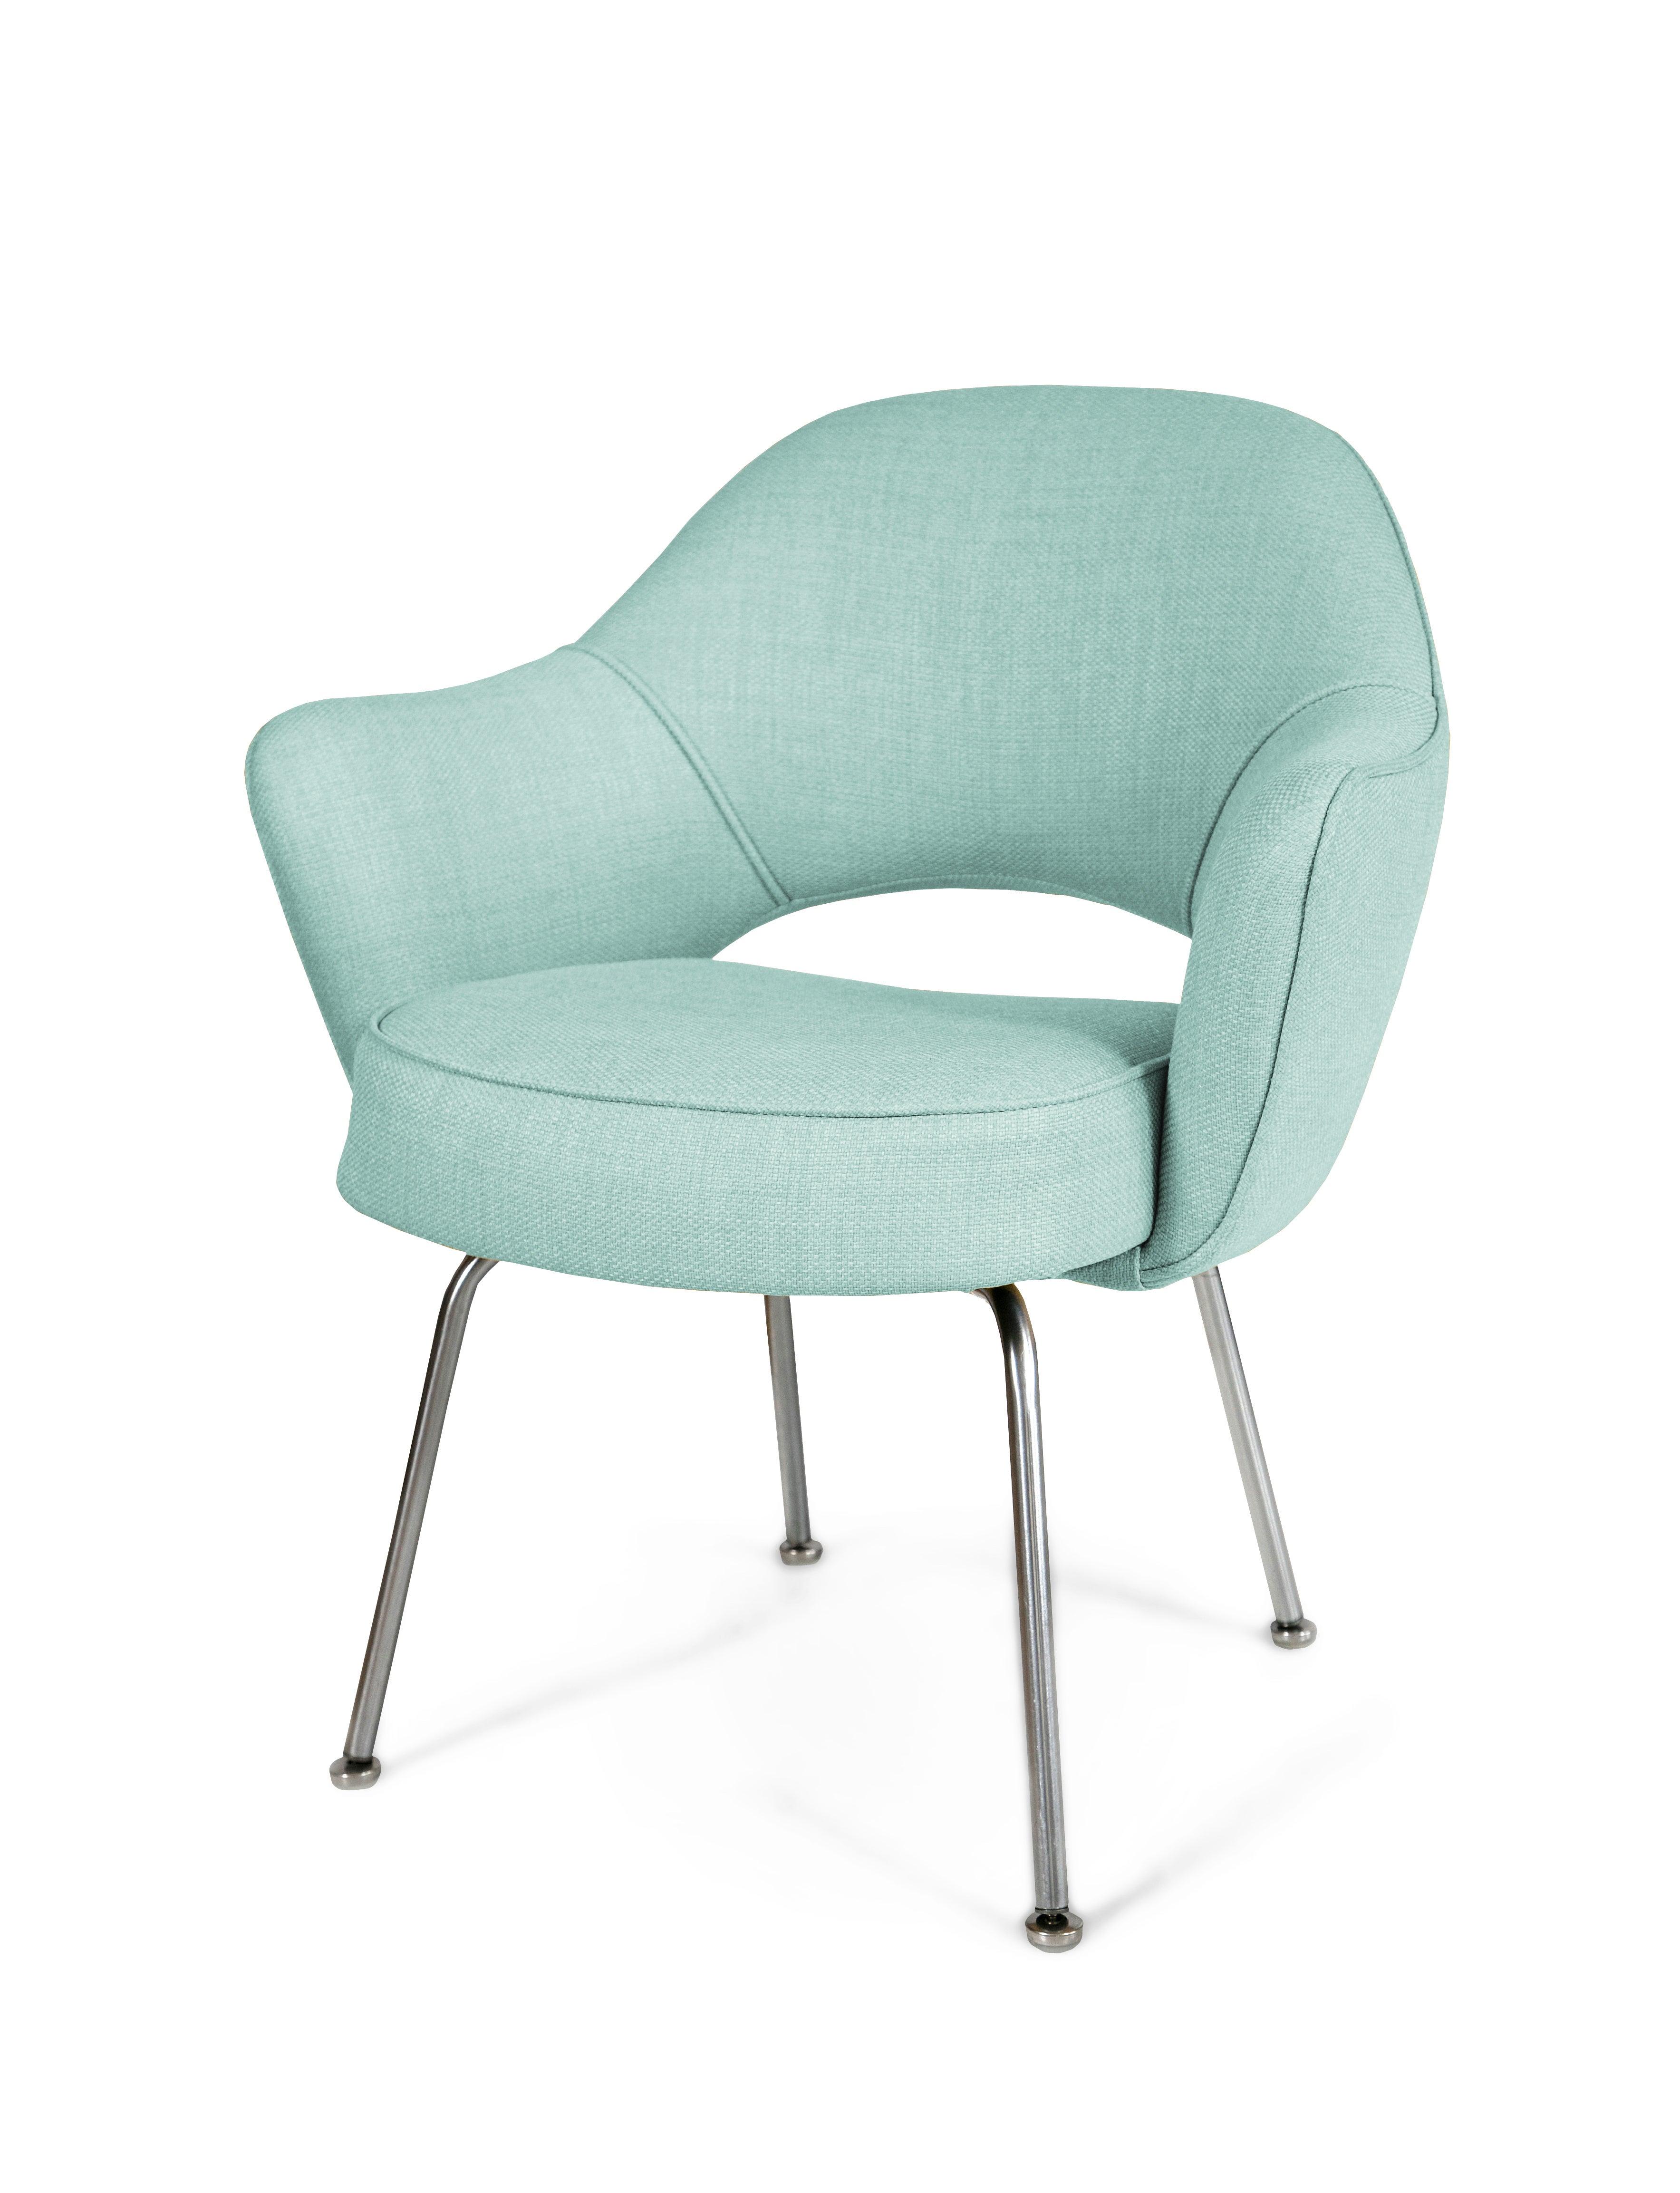 Saarinen Executive Arm Chairs In Powder Blue Weave, Set Of